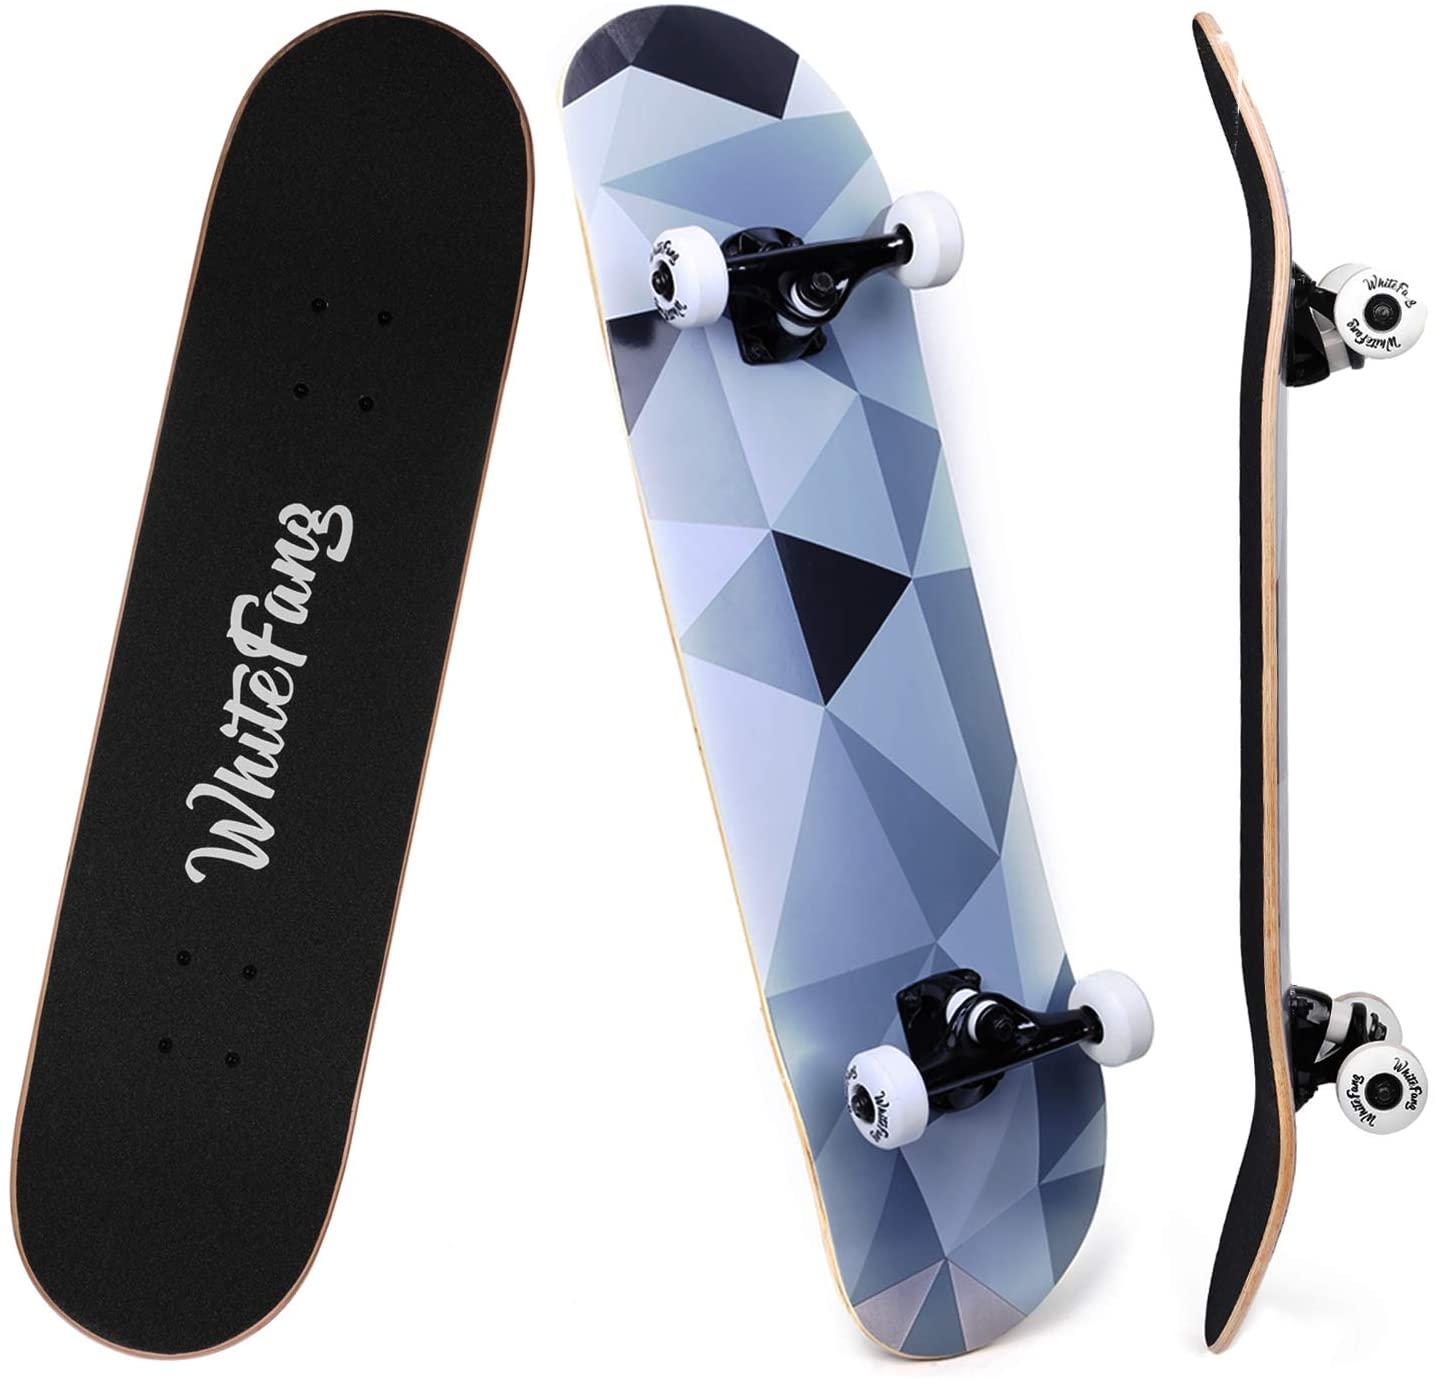 WhiteFang Complete Skateboards